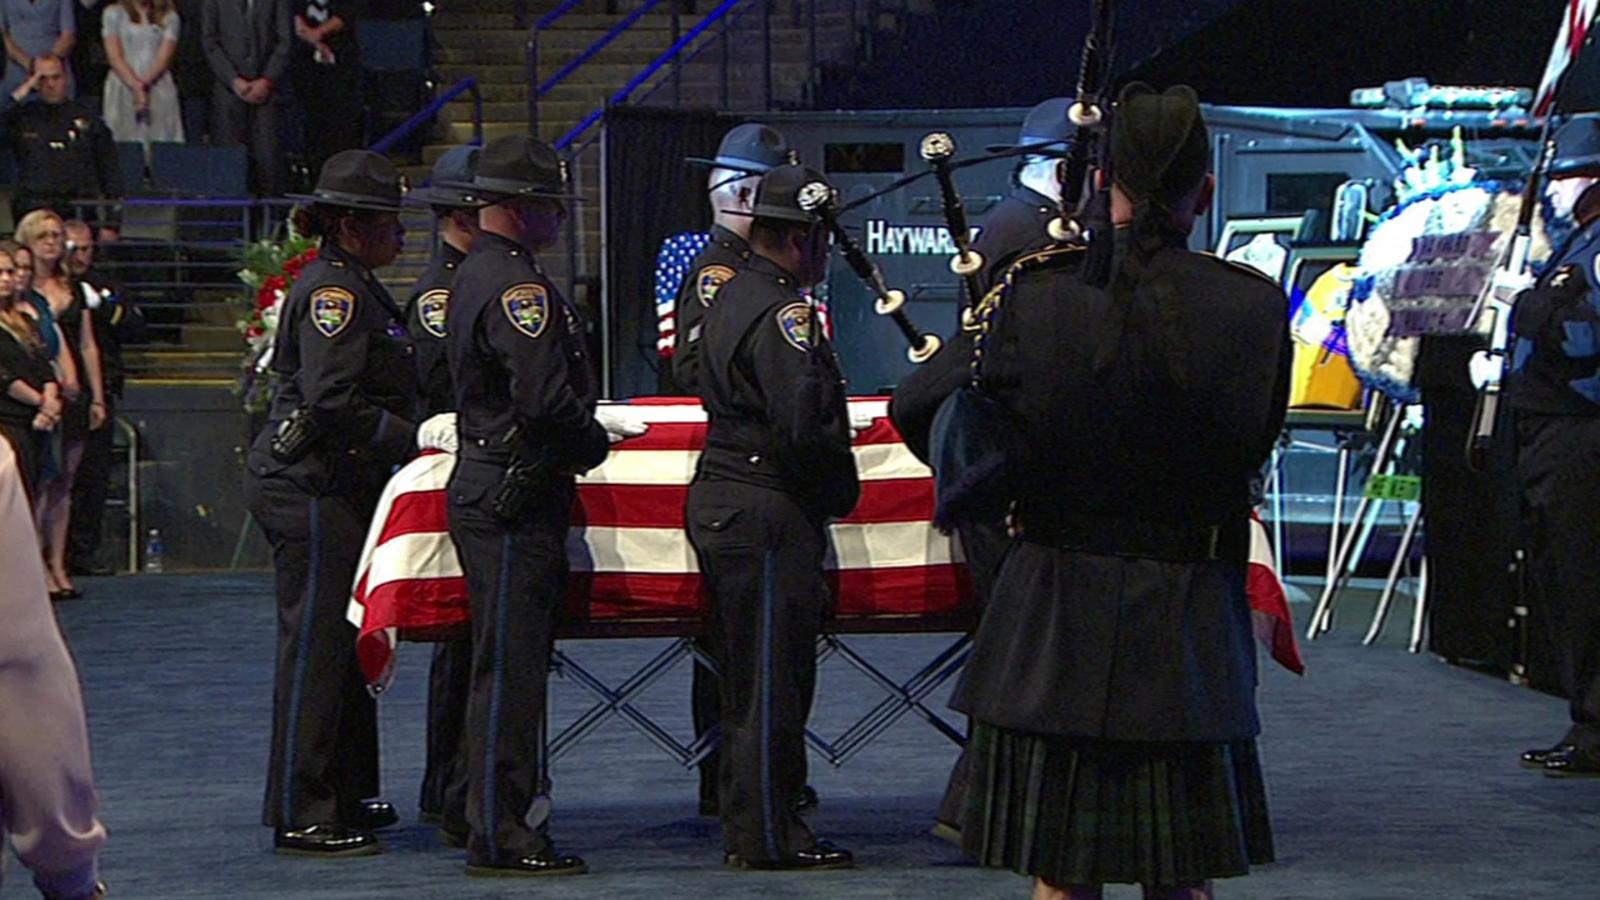 VIDEO: Bagpipes play at Hayward sergeant's memorial